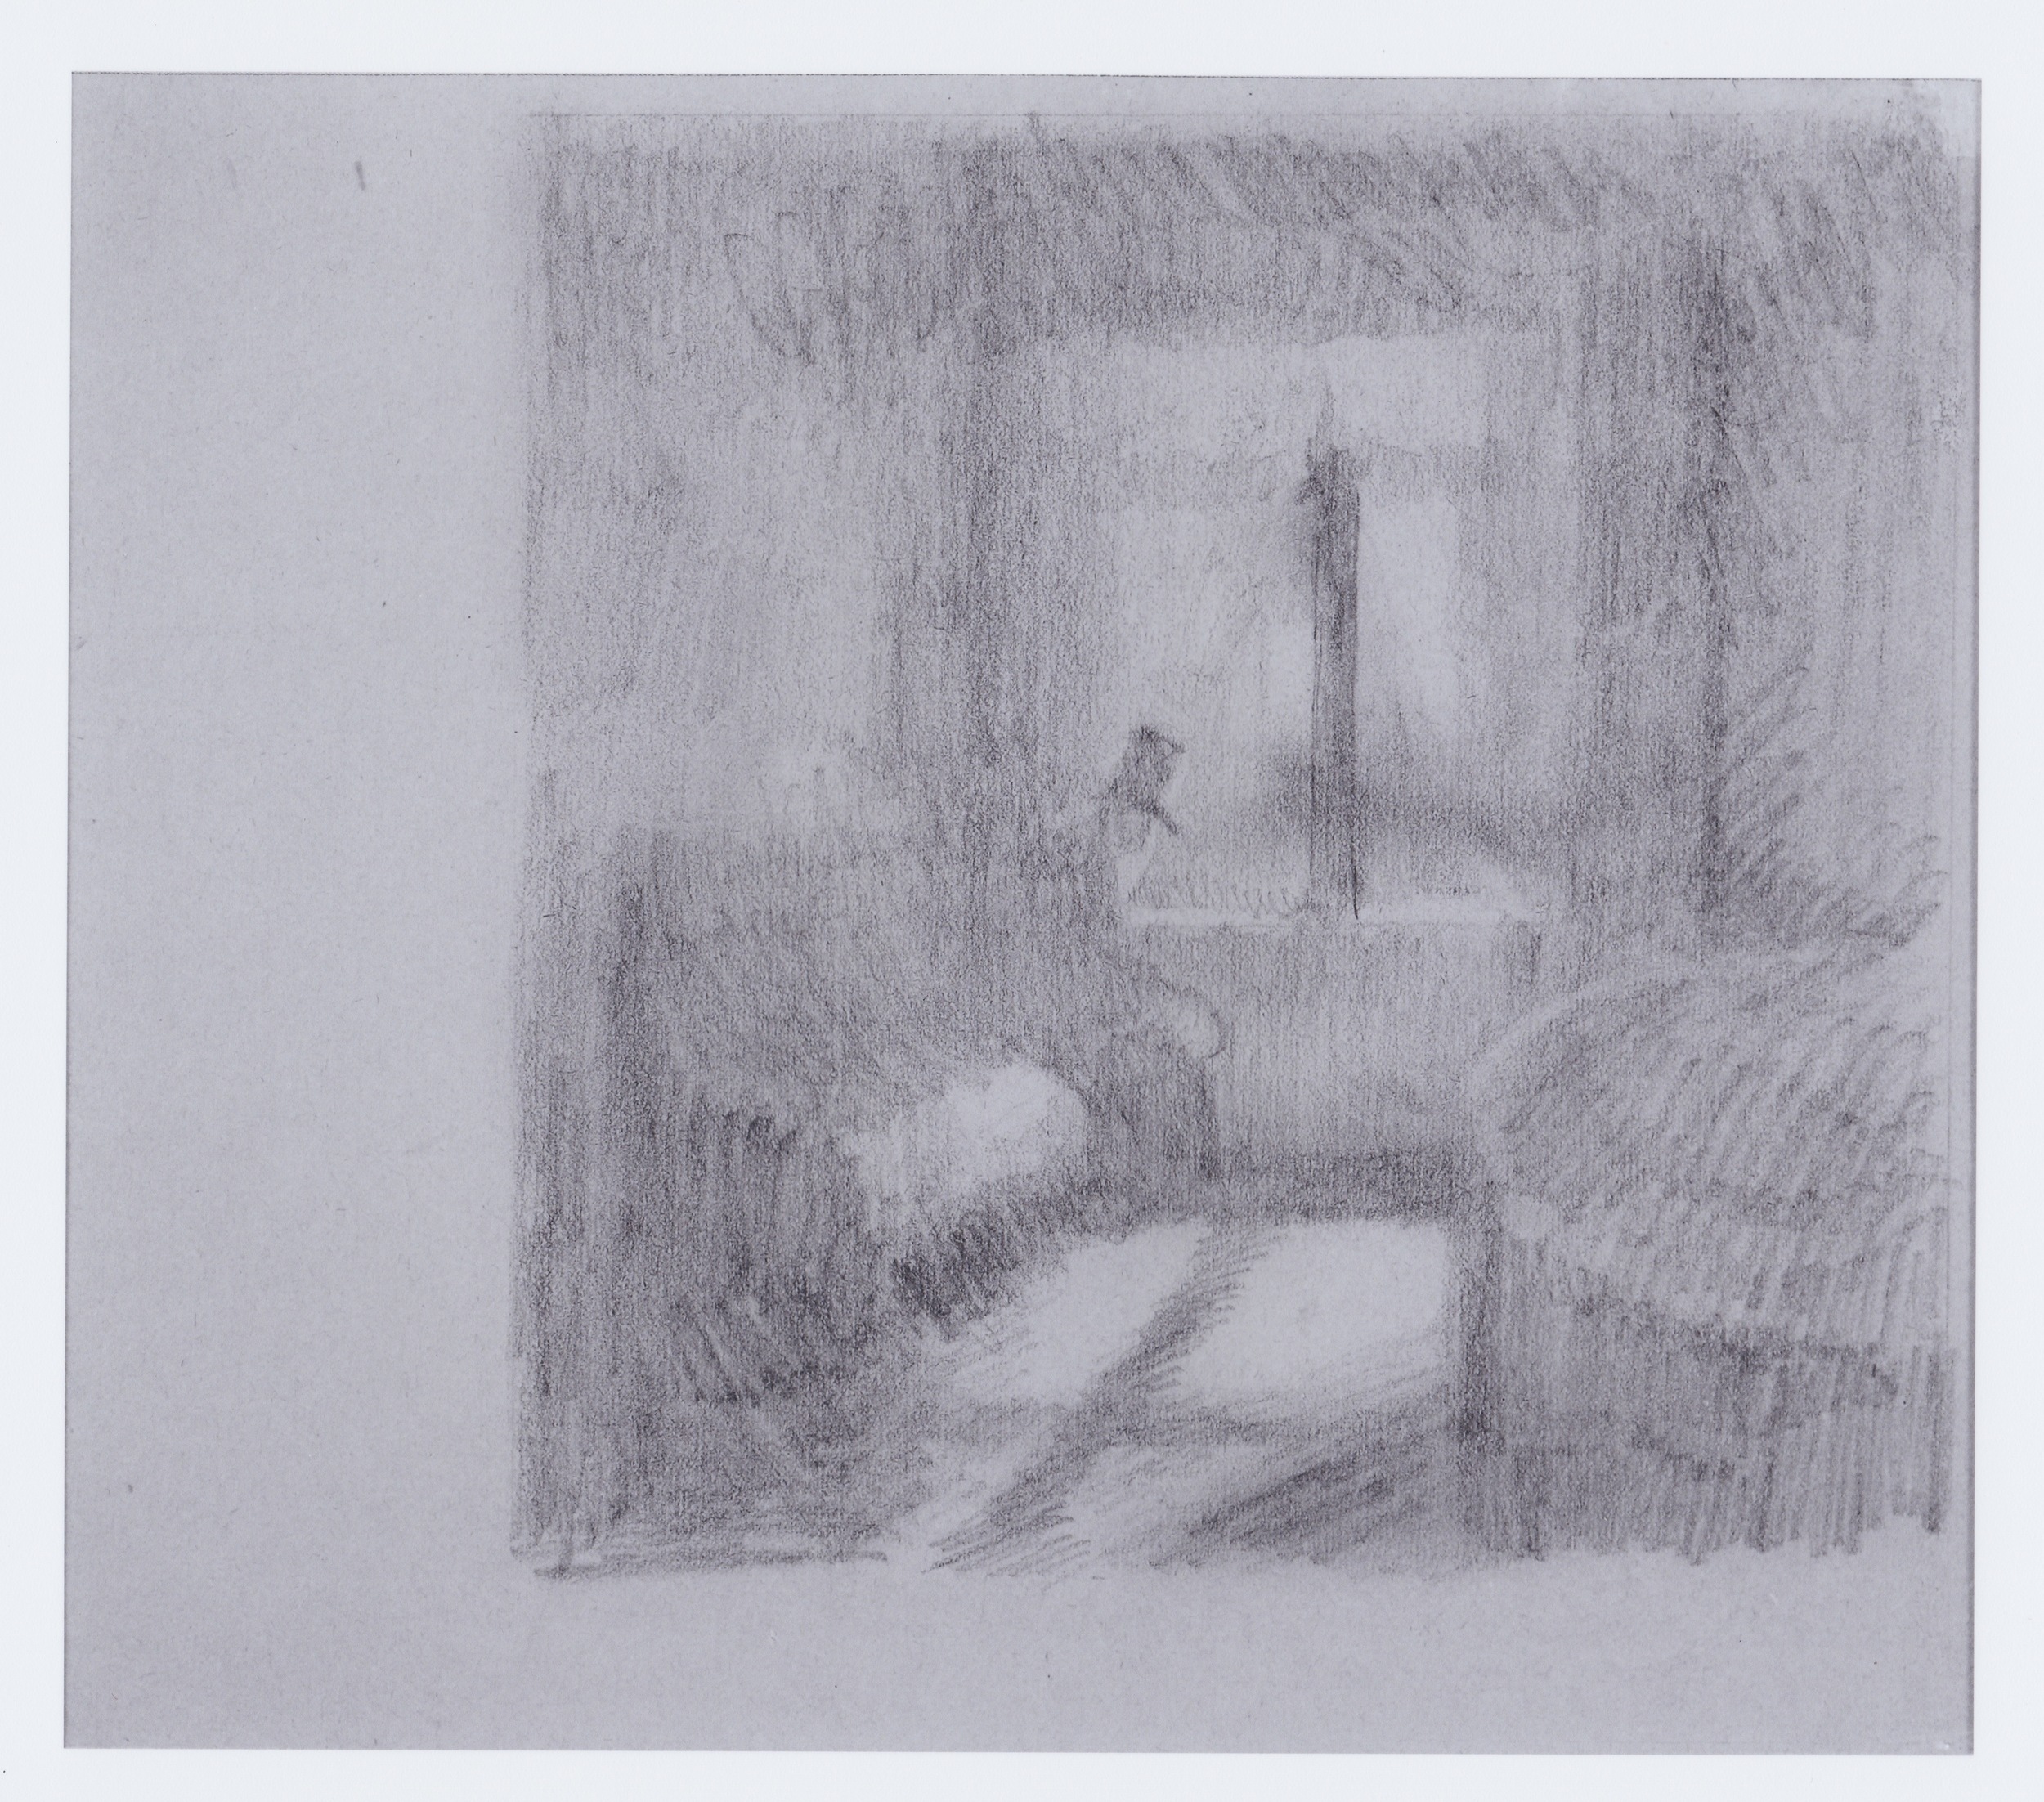 Edvard Munch – St. Cloud Night